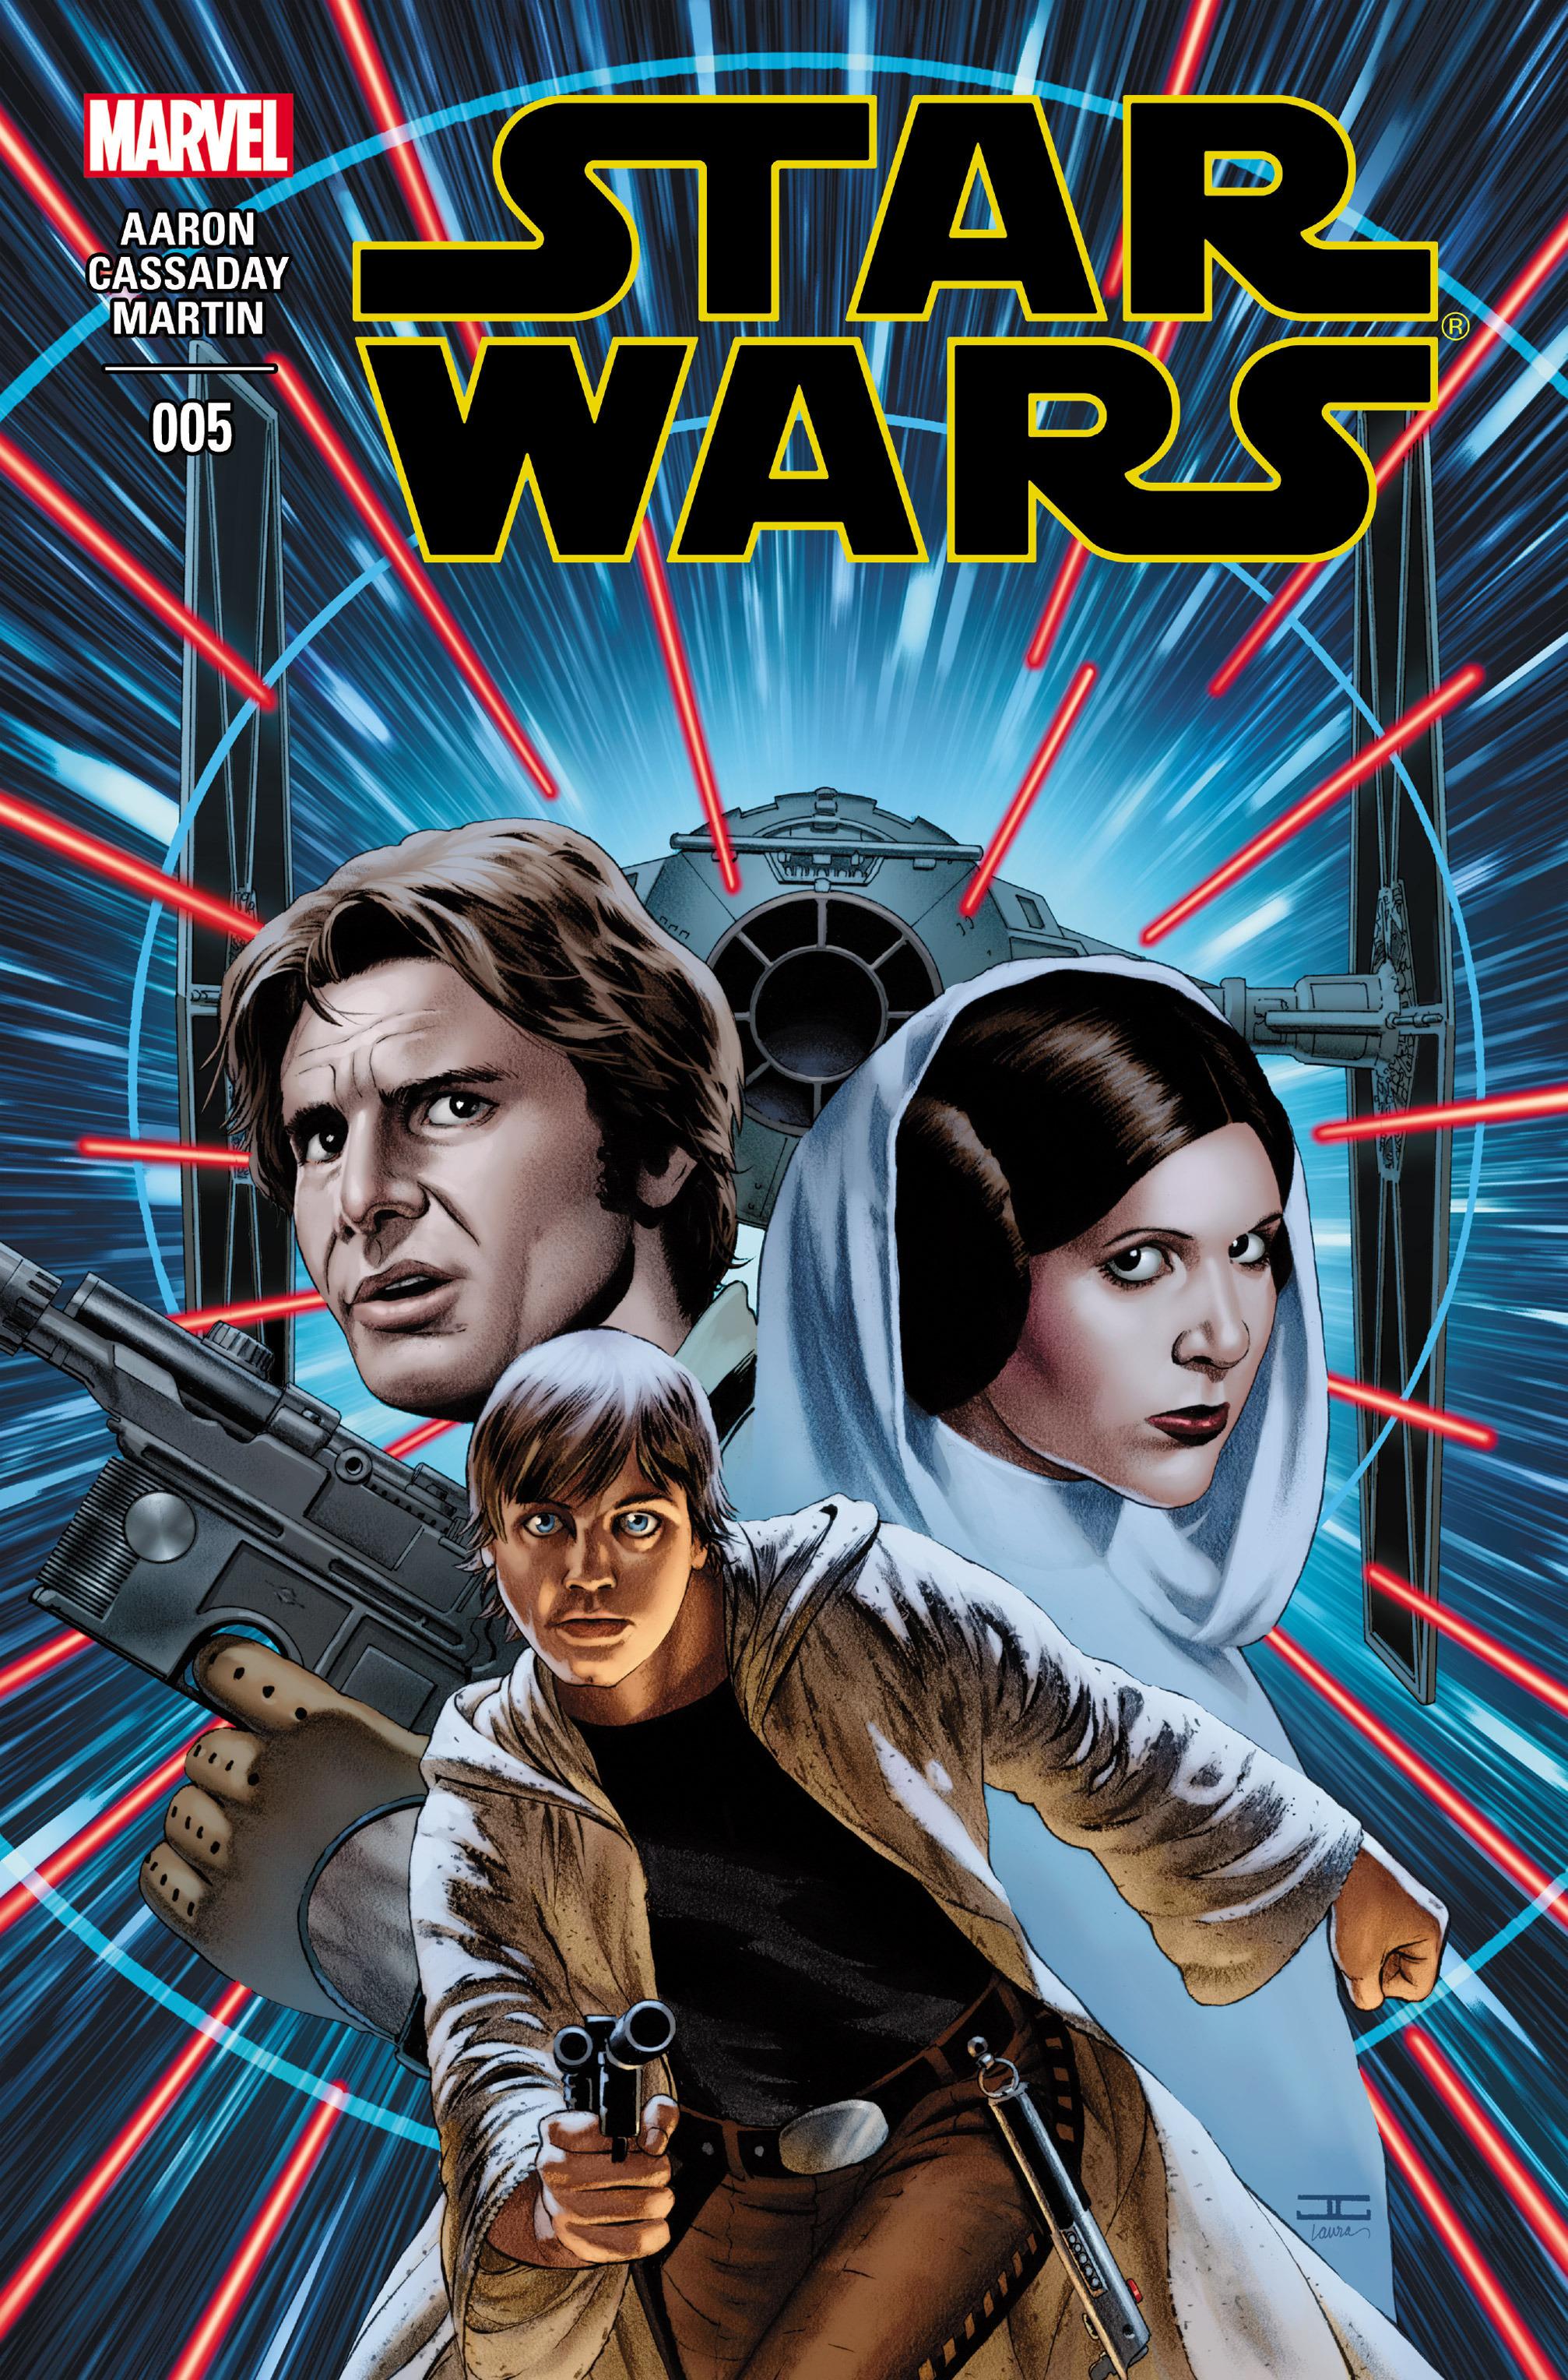 Star-Wars-005-000a